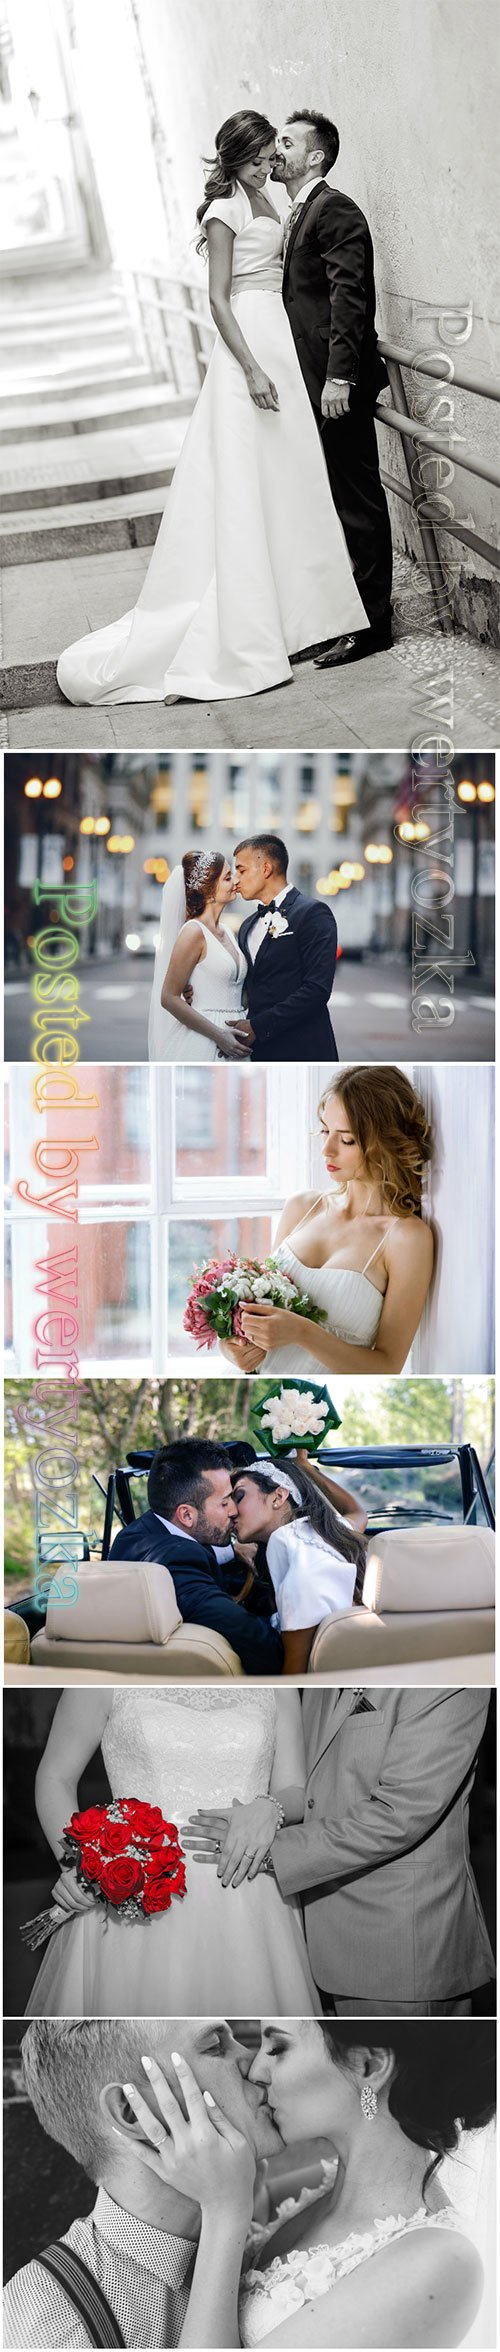 Bride and groom, wedding beautiful stock photo